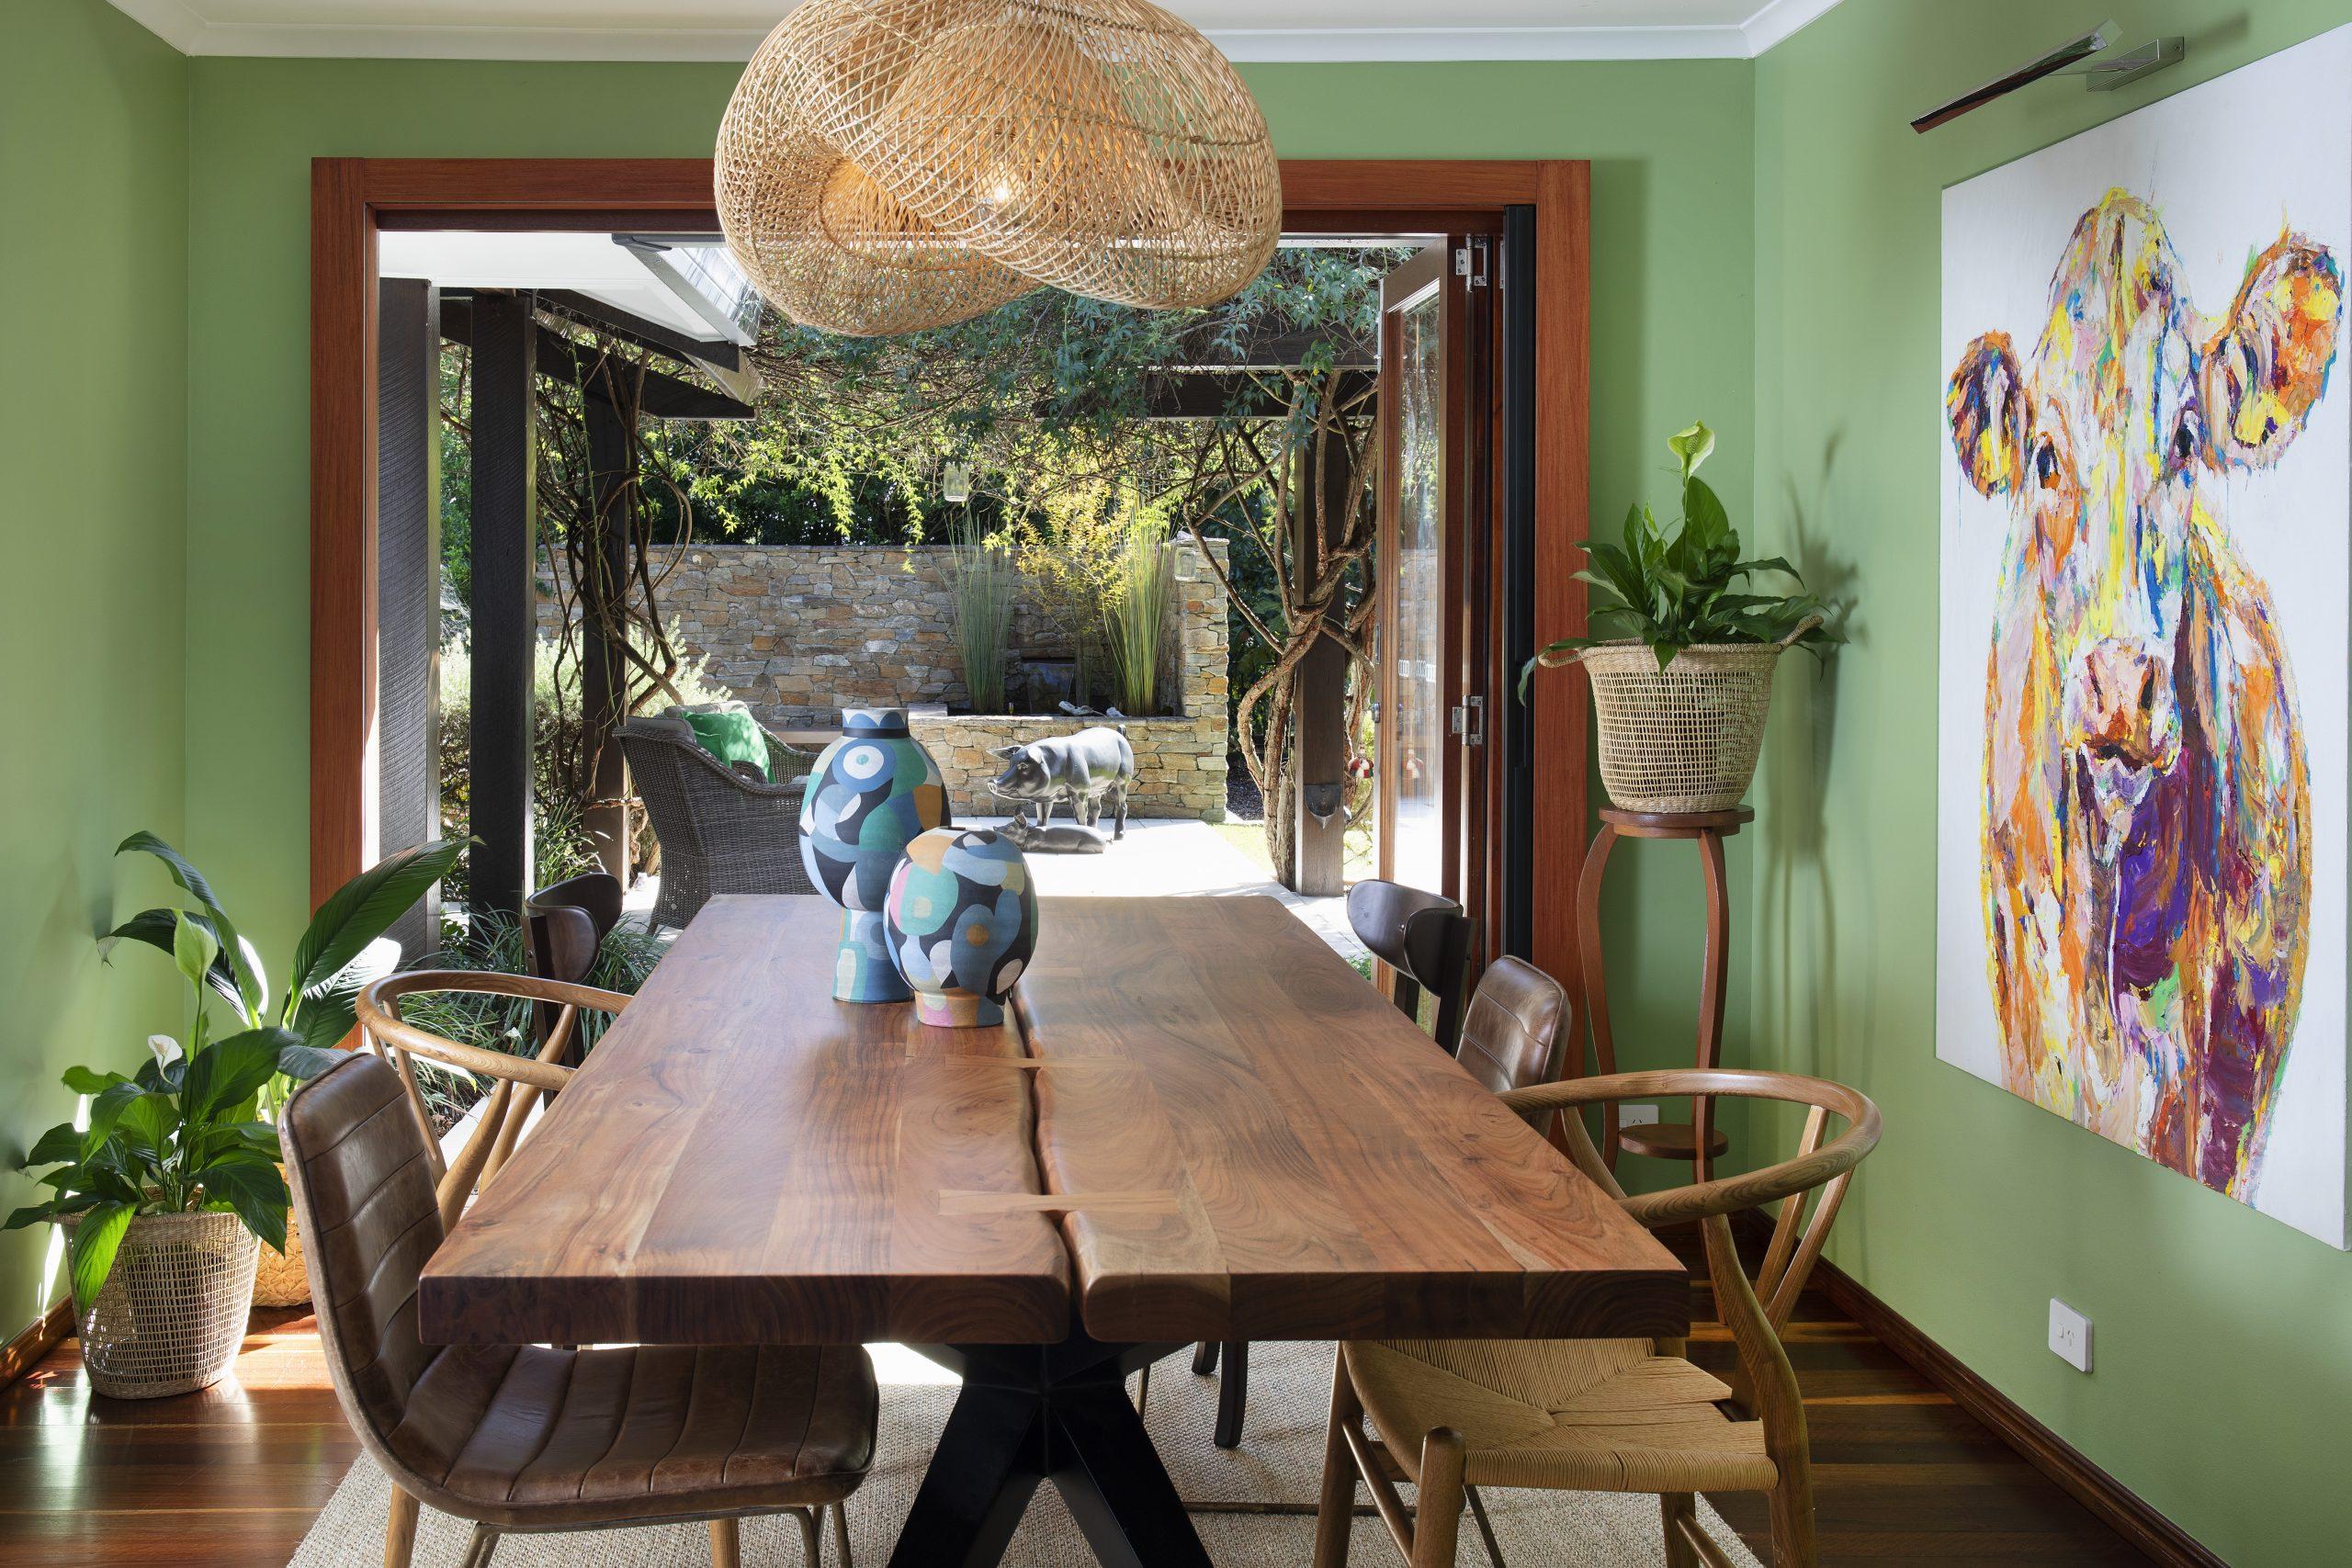 https://www.ivyandfinch.com.au/wp-content/uploads/2016/05/Interior-Design-Brookfield-Dining-Room-1-scaled.jpg